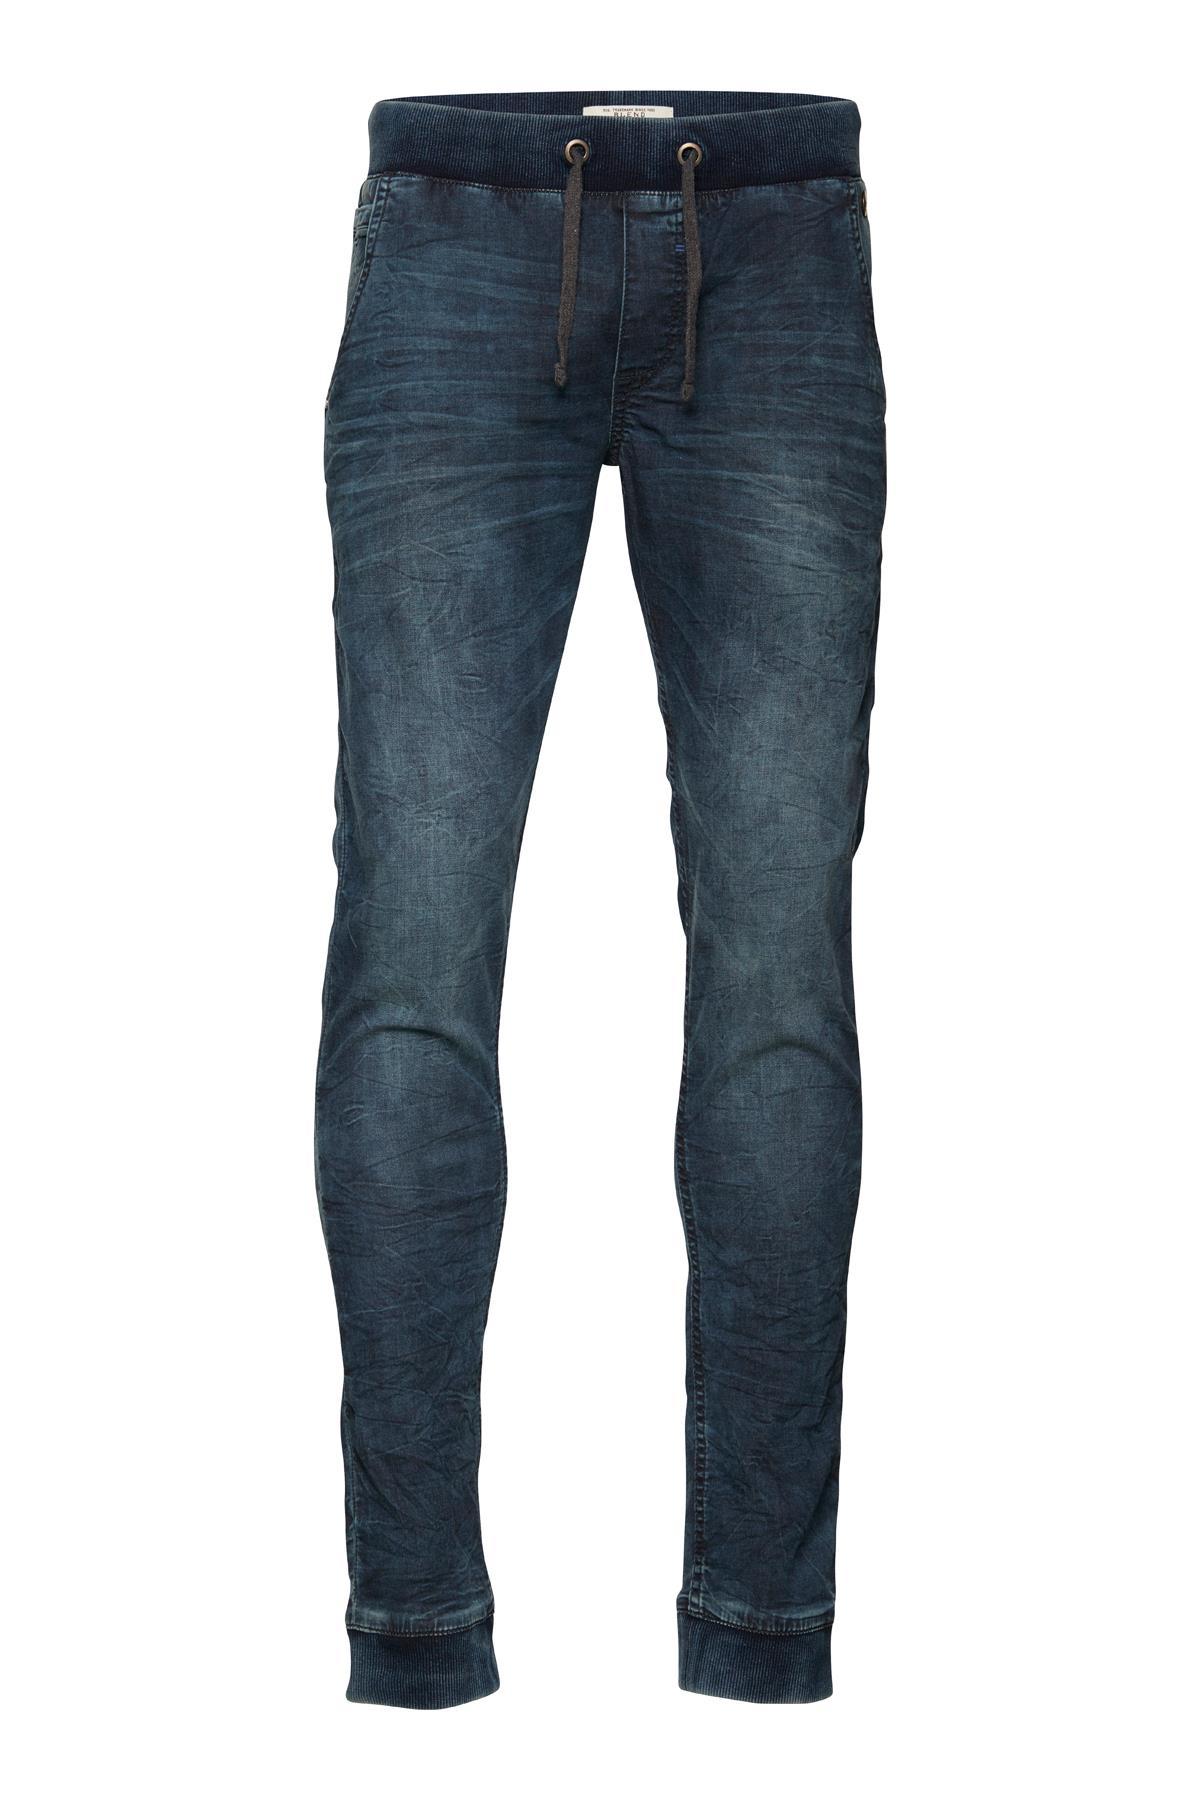 Denimblå Blizzard jeans – Køb Denimblå Blizzard jeans fra str. S-XXL her